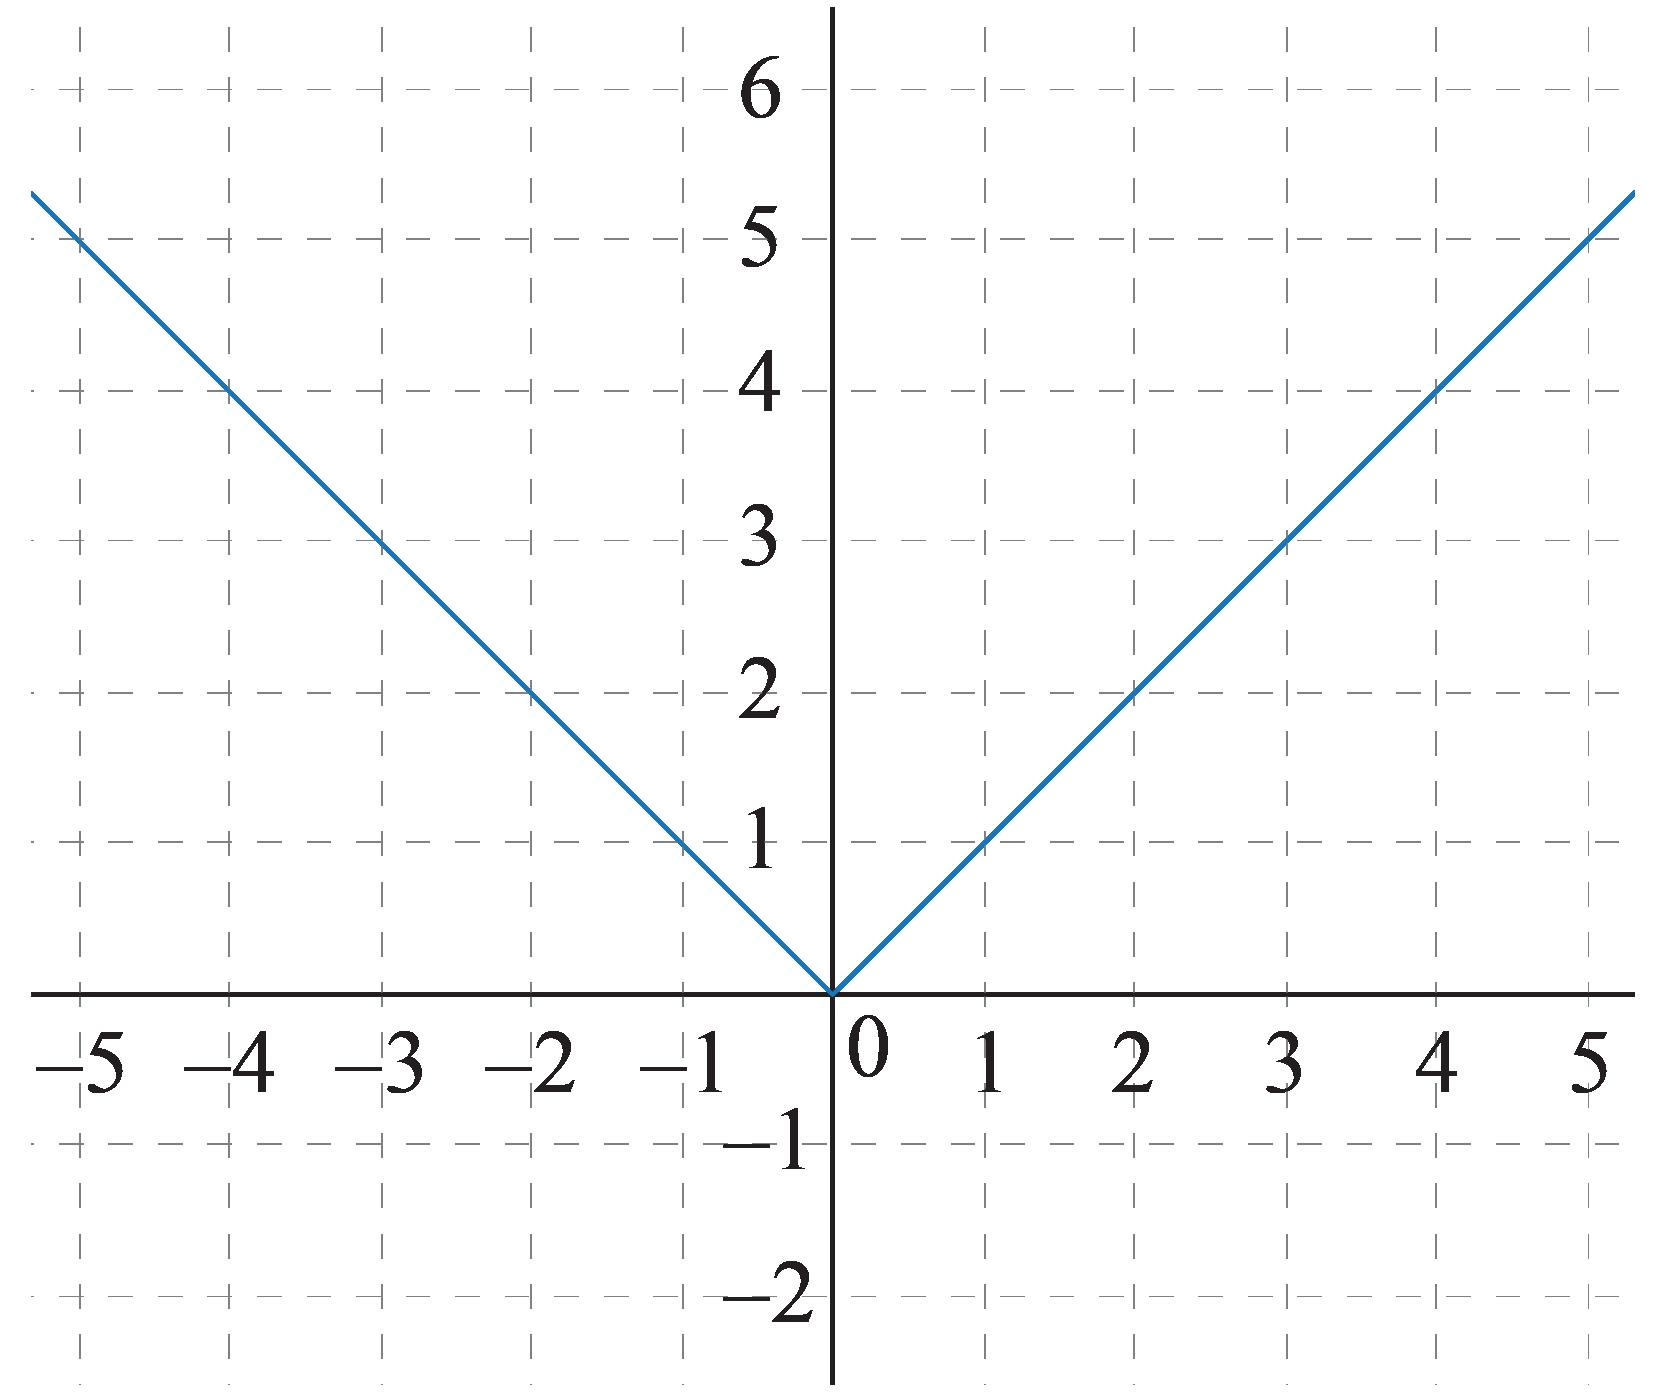 Vertical translation graph 1